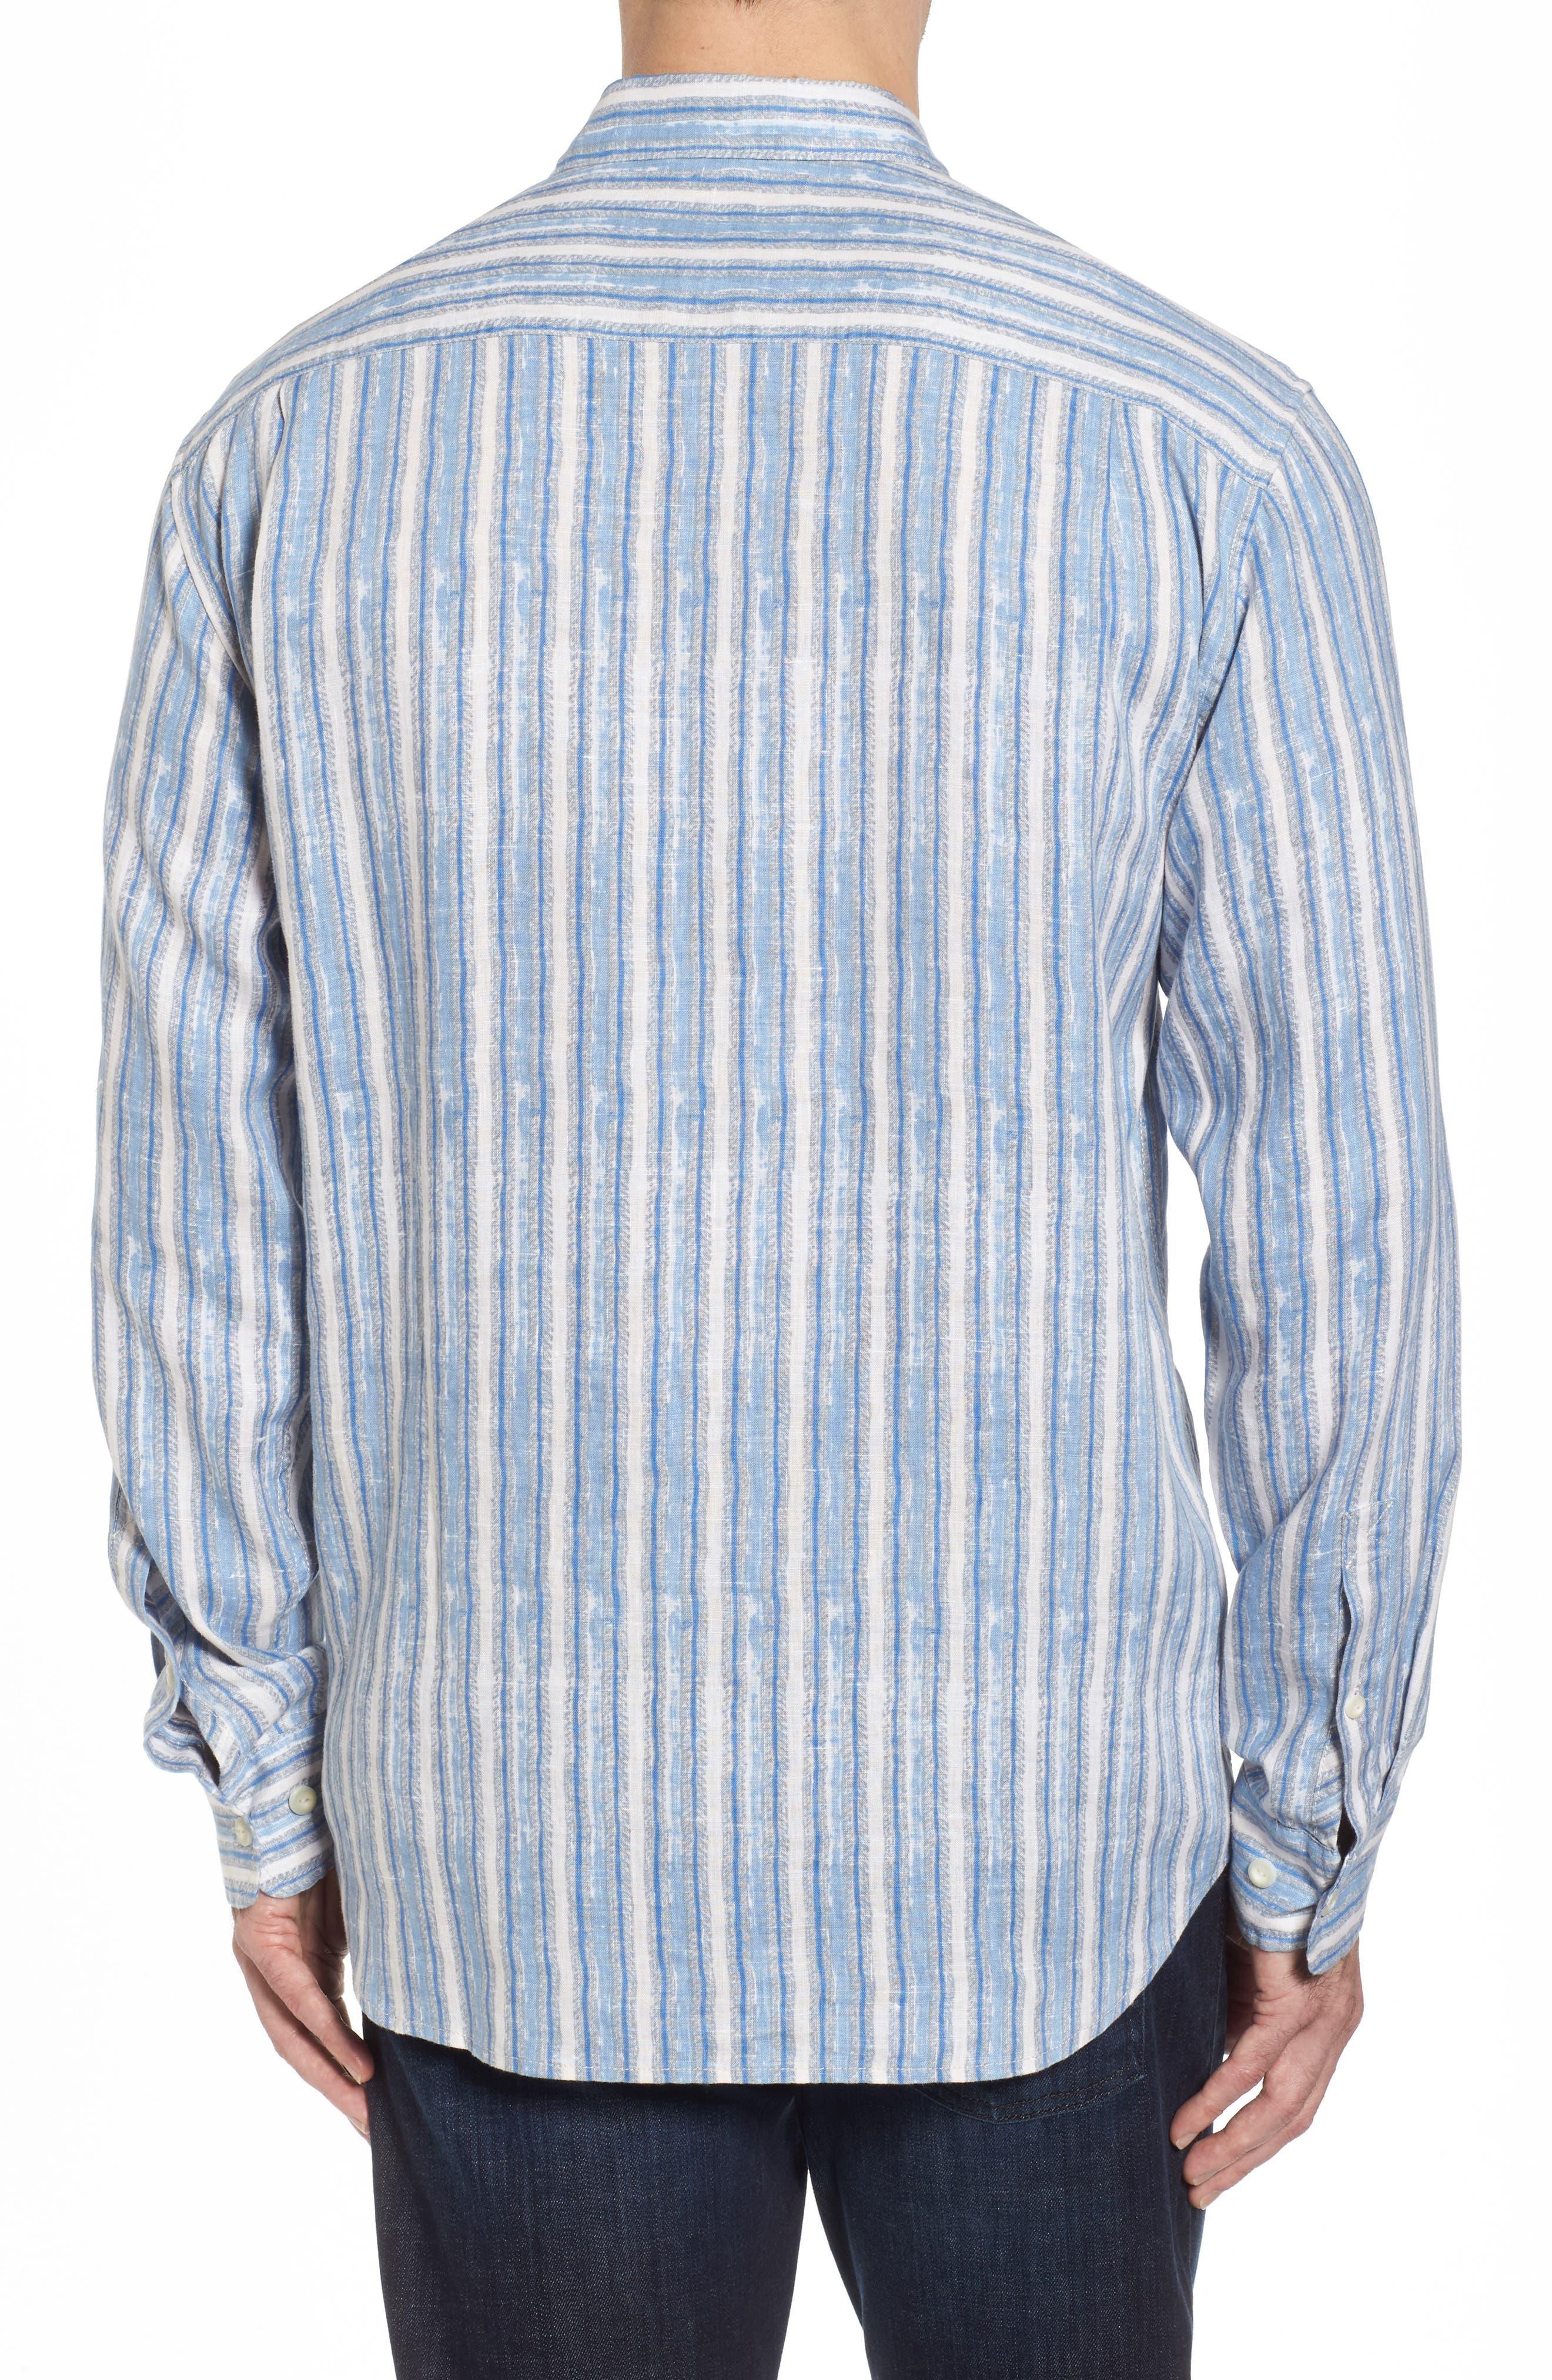 Along Shore Stripe Linen Sport Shirt,                             Alternate thumbnail 2, color,                             Fjord